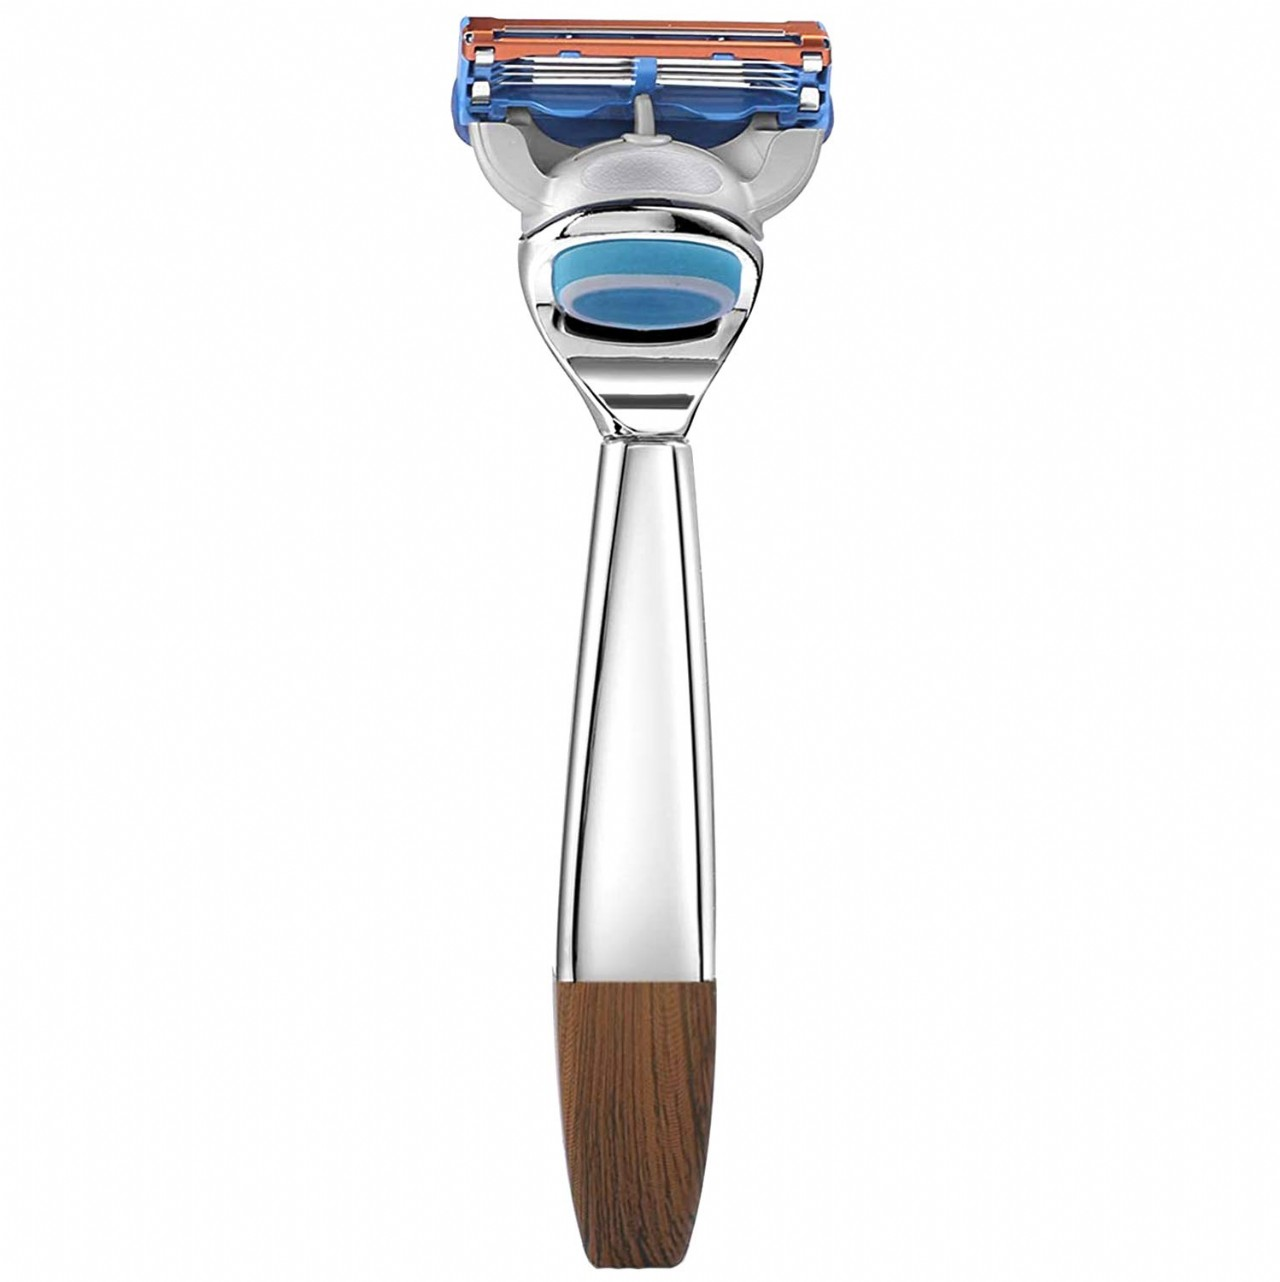 ACRIMAX Deluxe Men's Razors for Shaving, Shaving Razor Blades Refills and Anti Slip Razor Handle